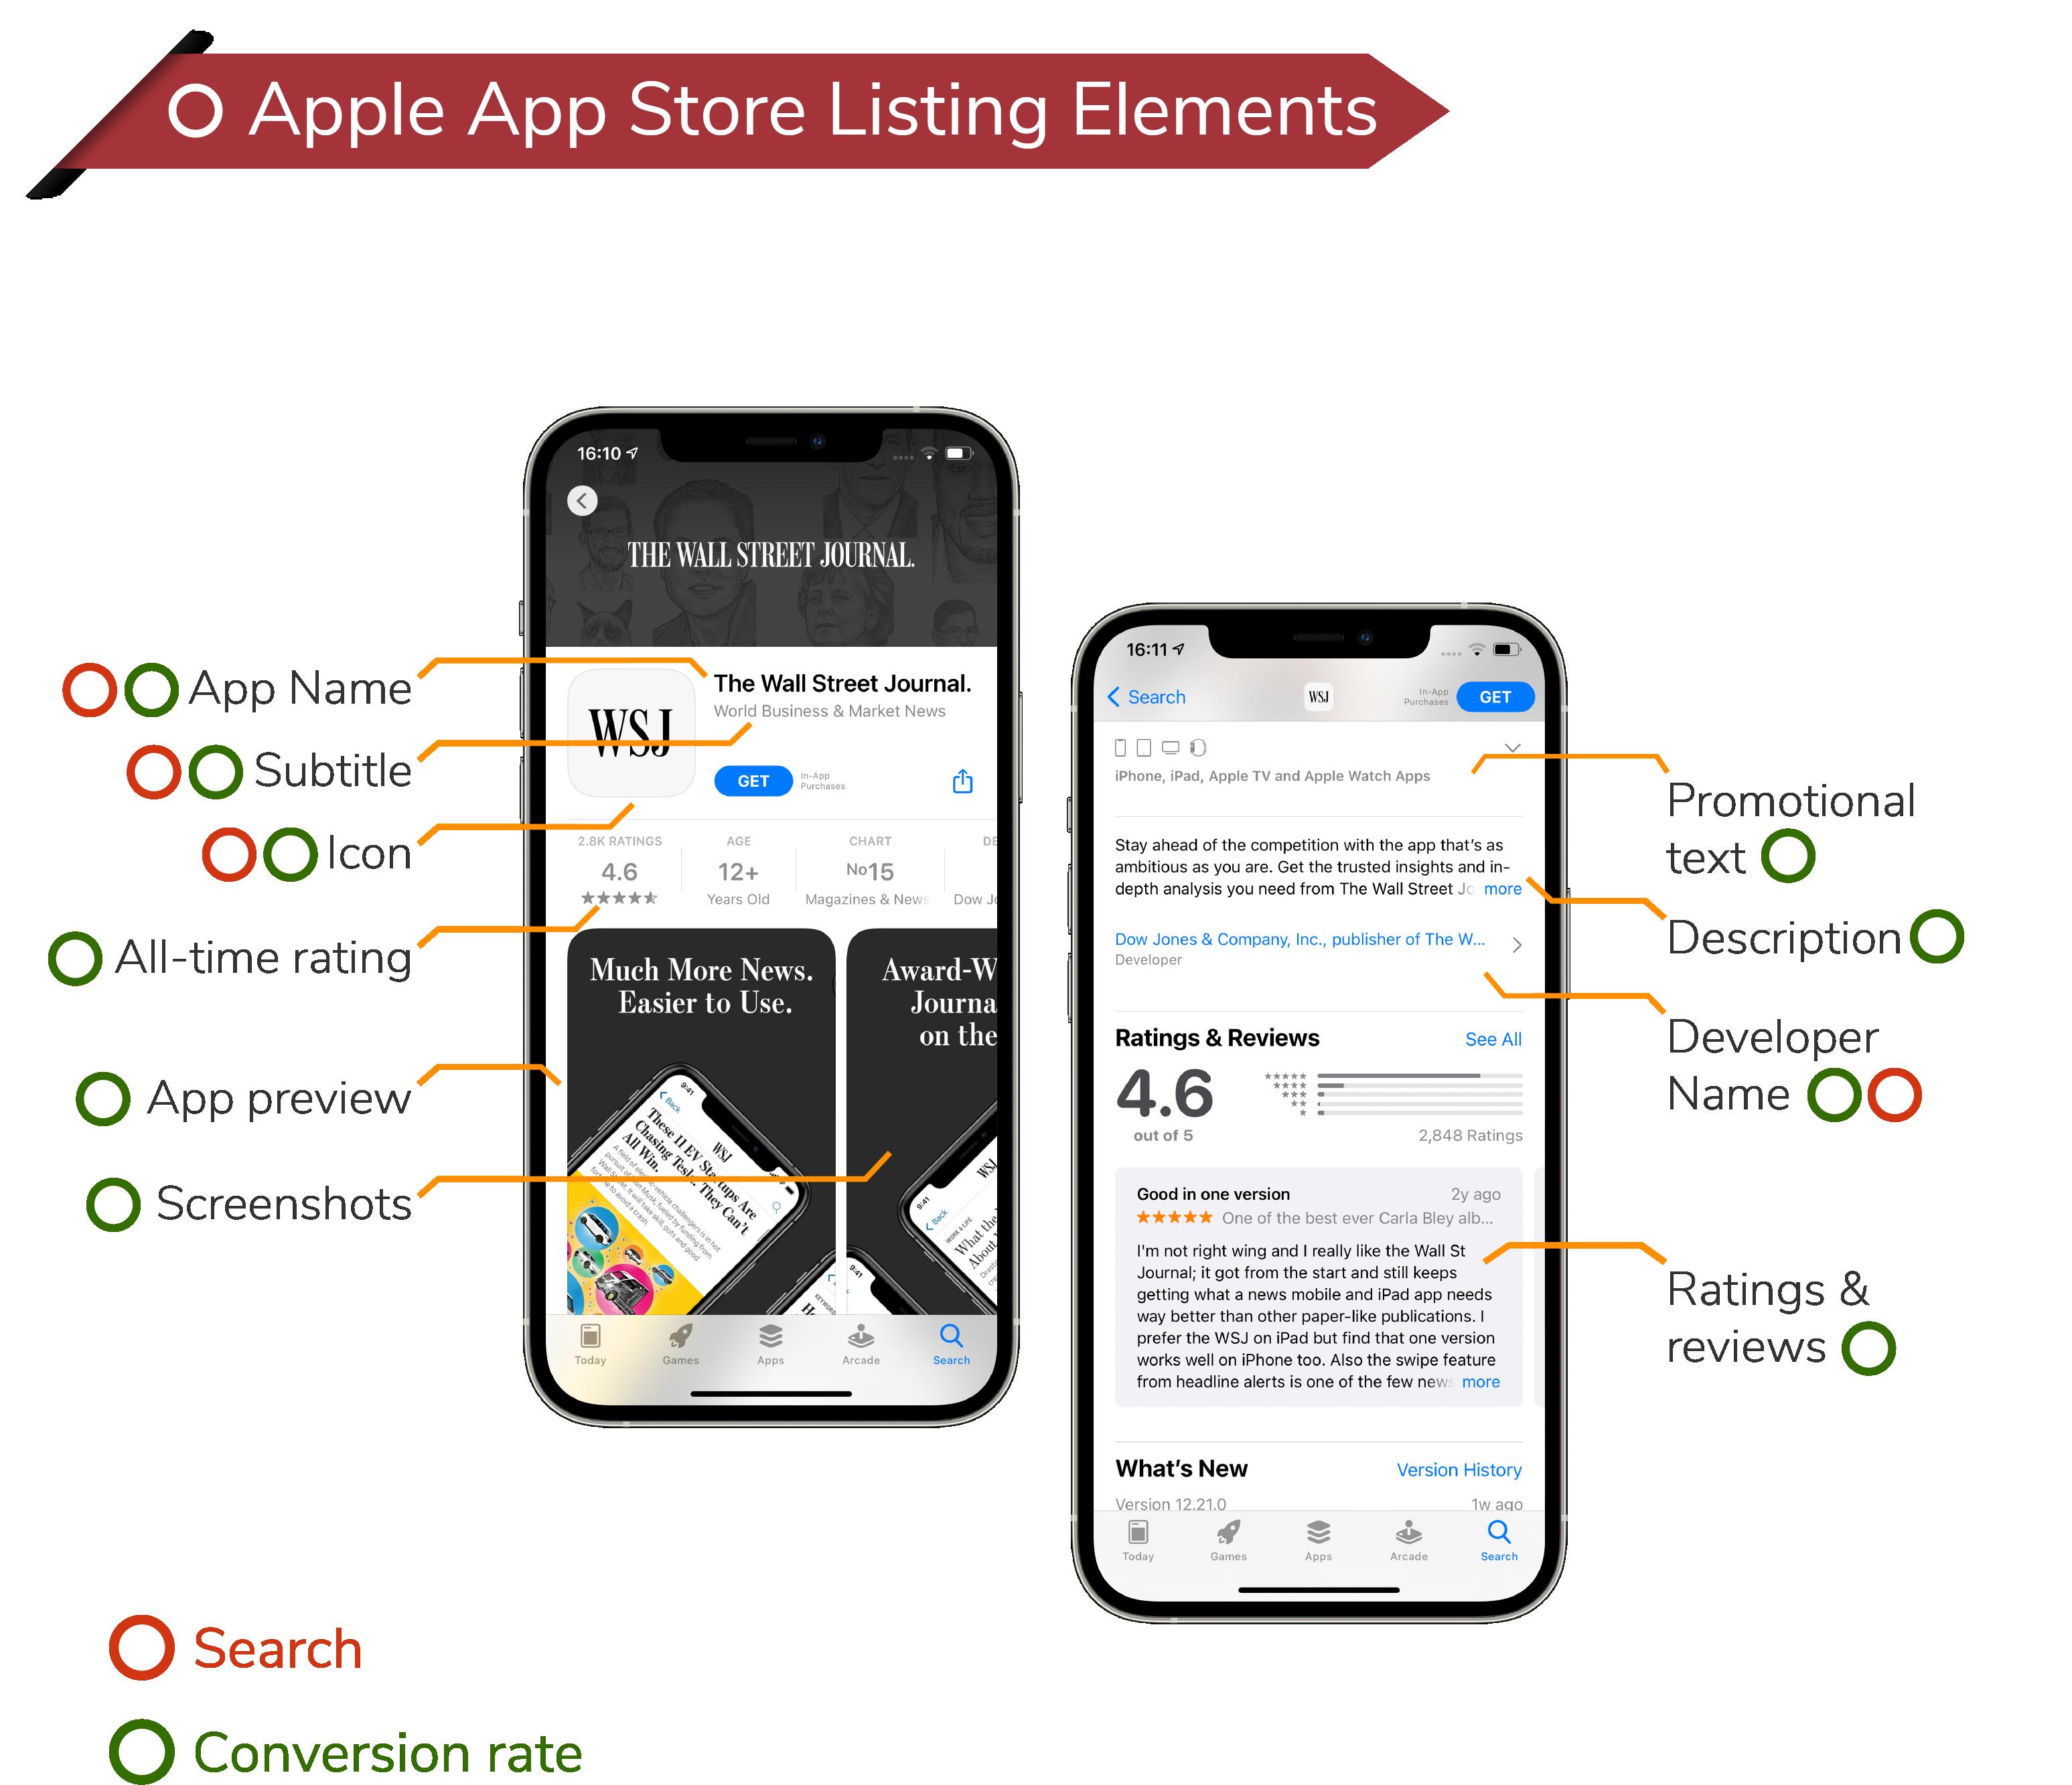 Apple App Store Listing Elements